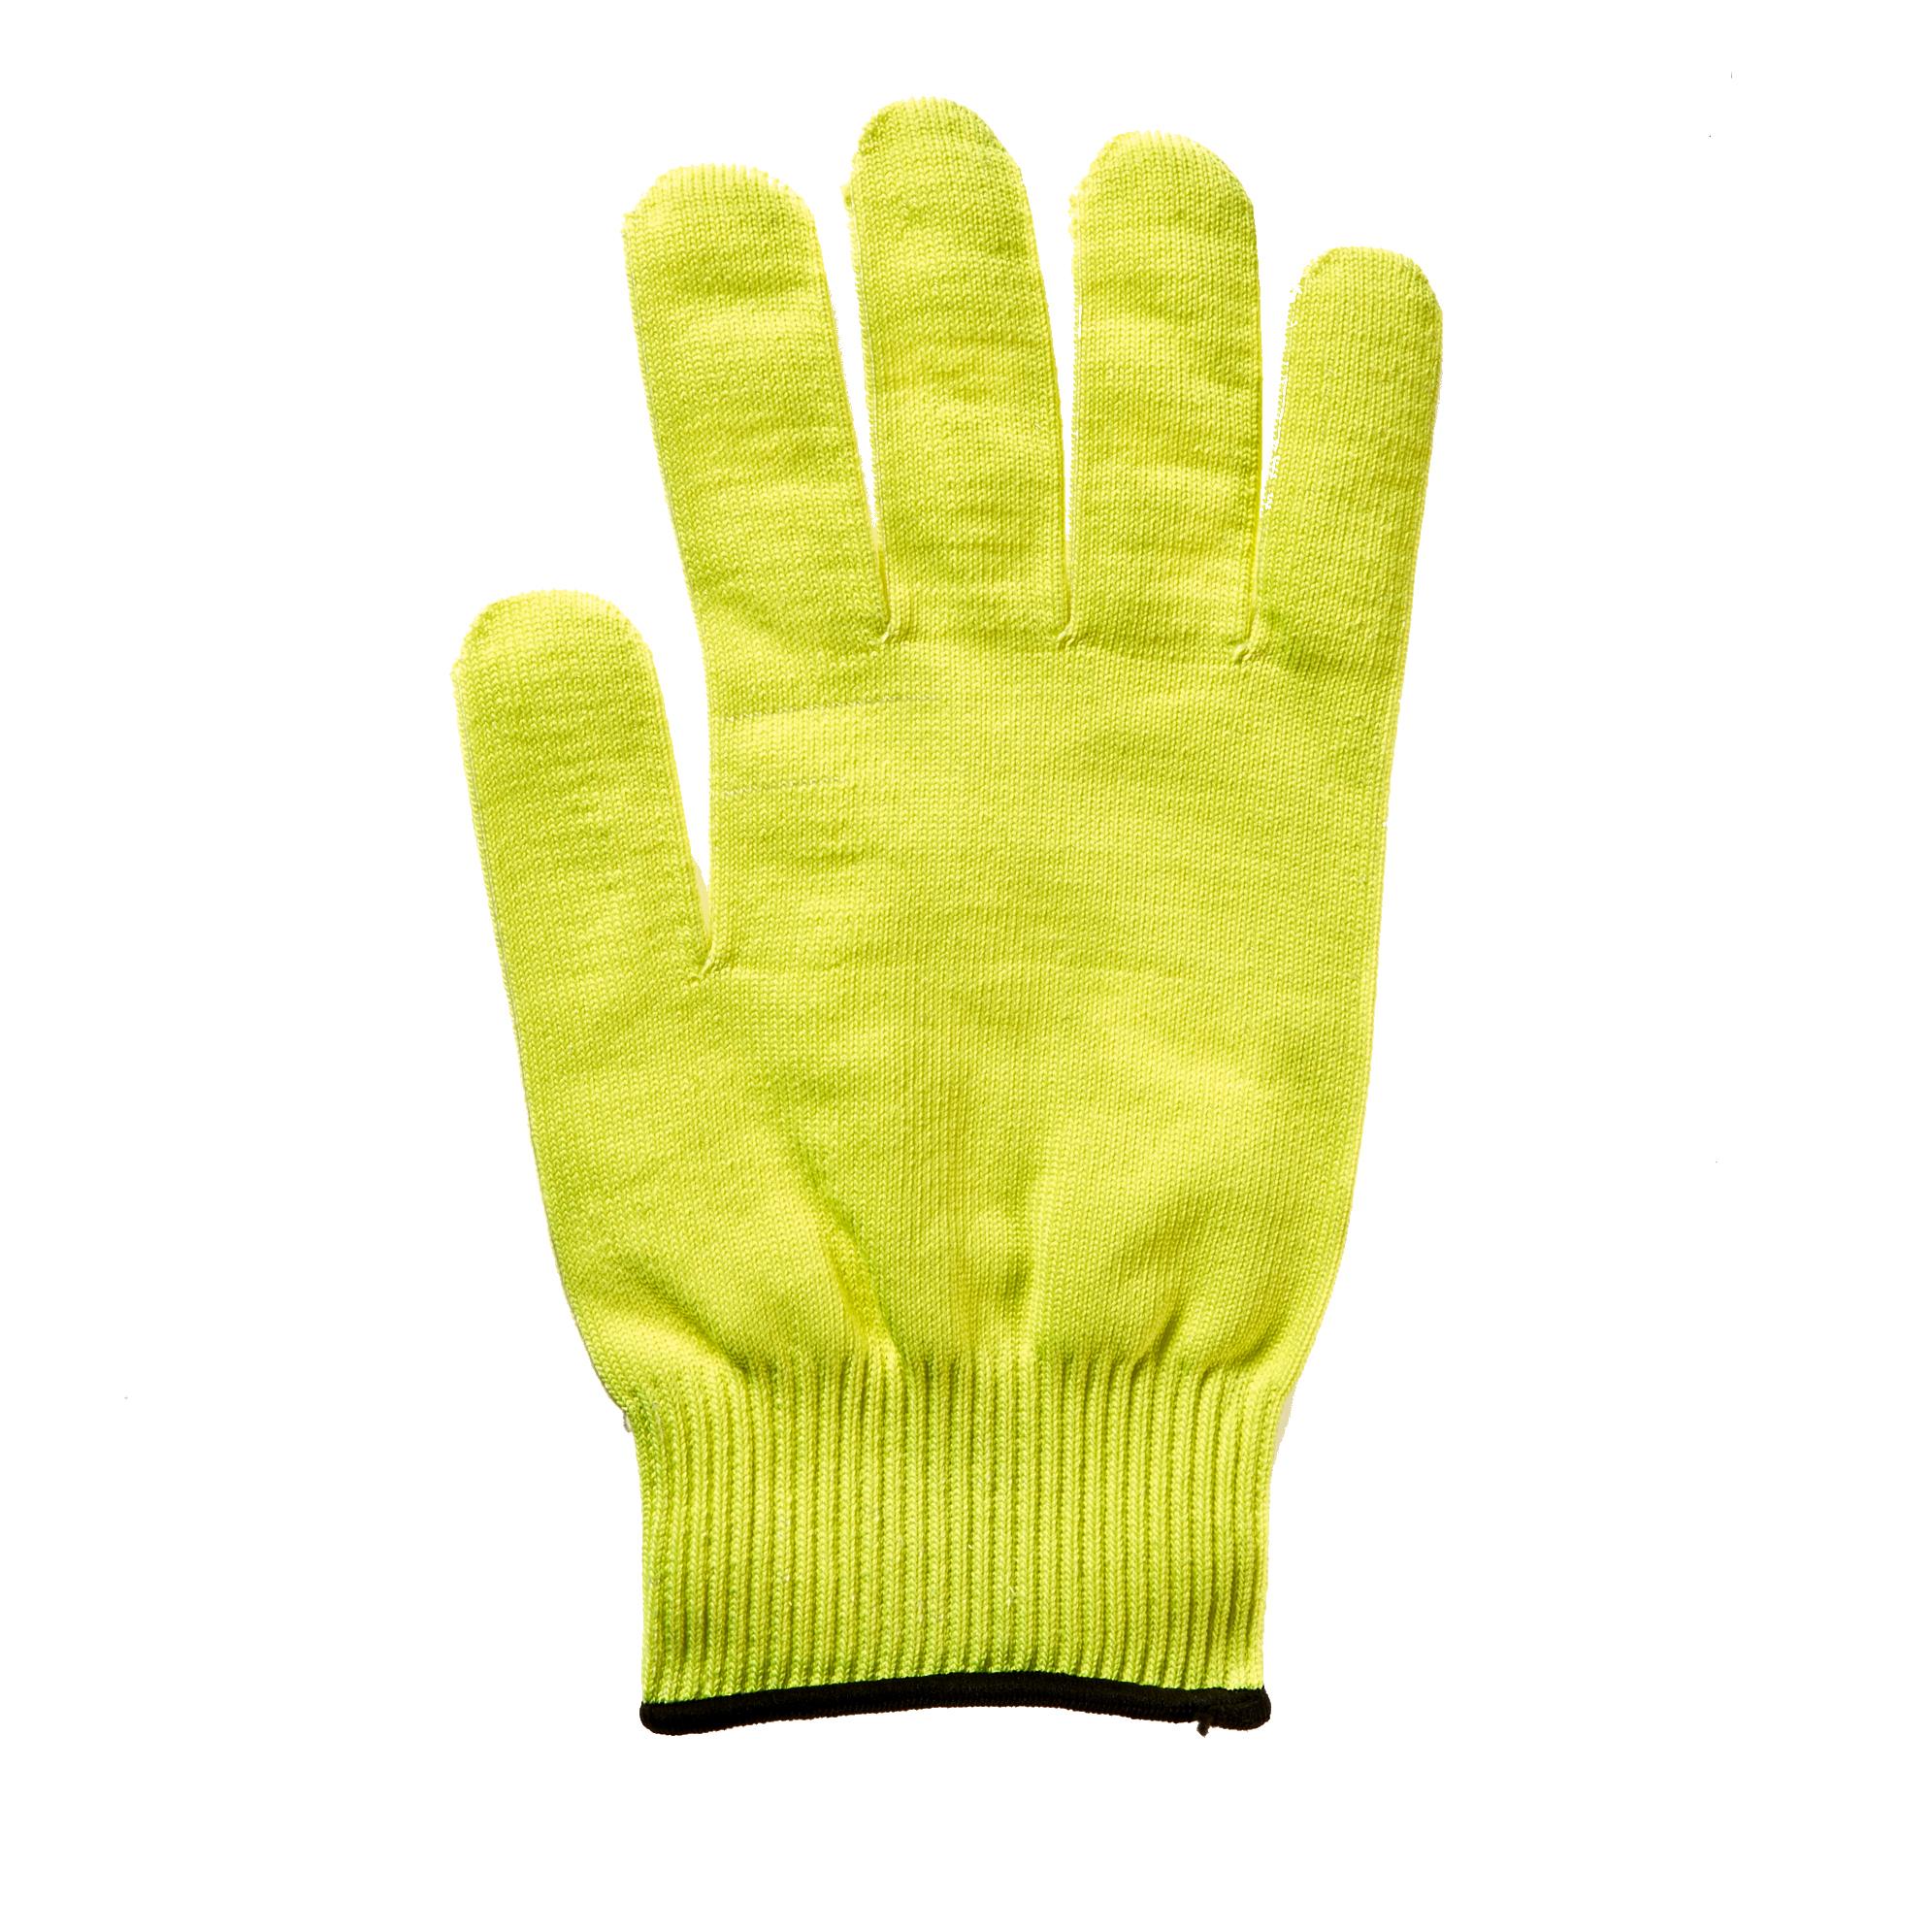 Mercer Culinary M33415YL1X glove, cut resistant